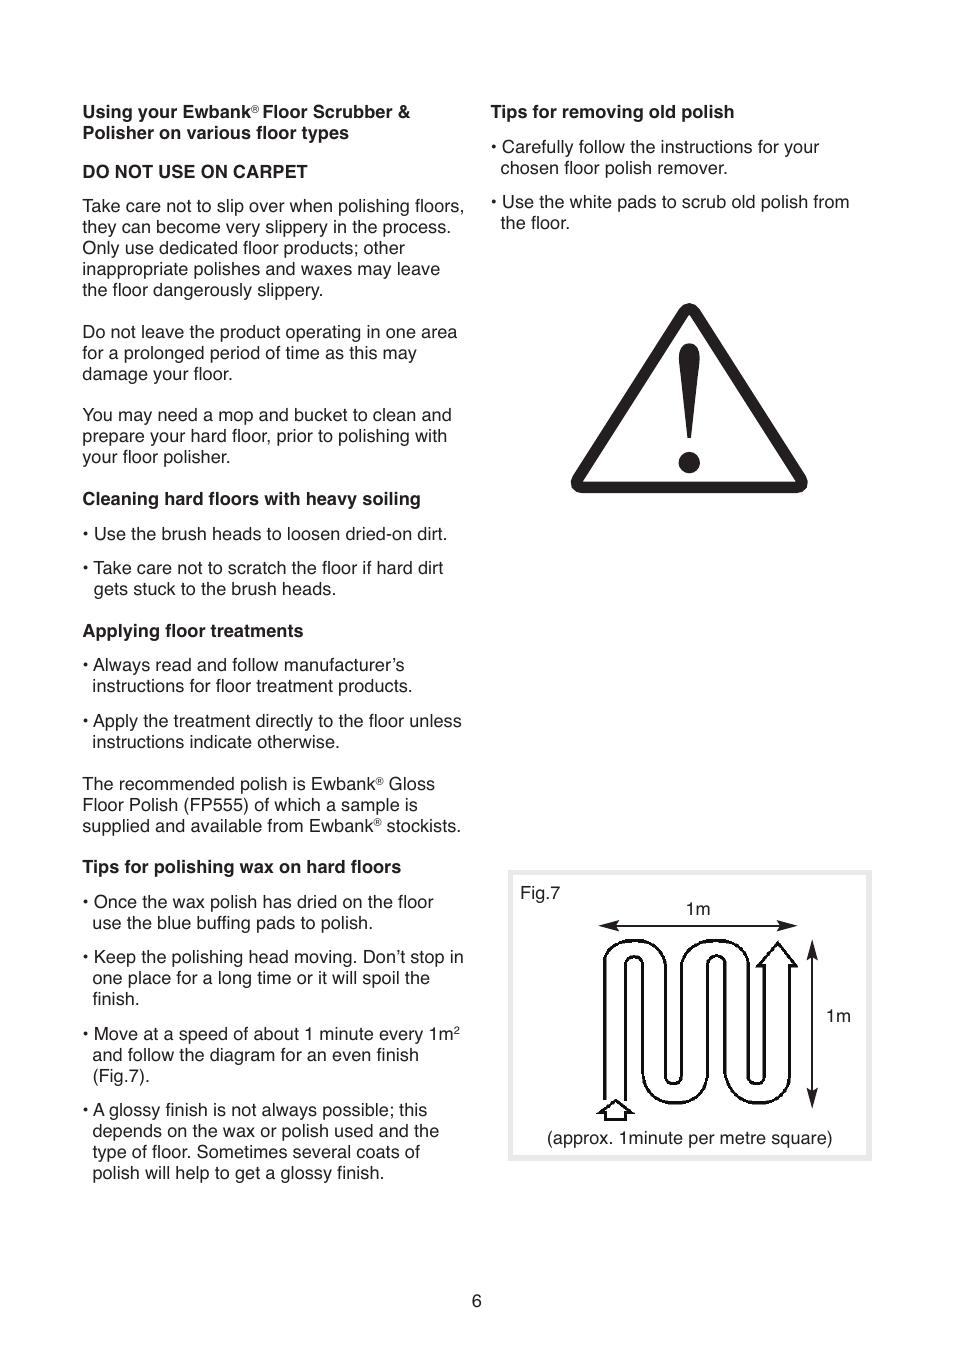 ewbank floor polisher instructions